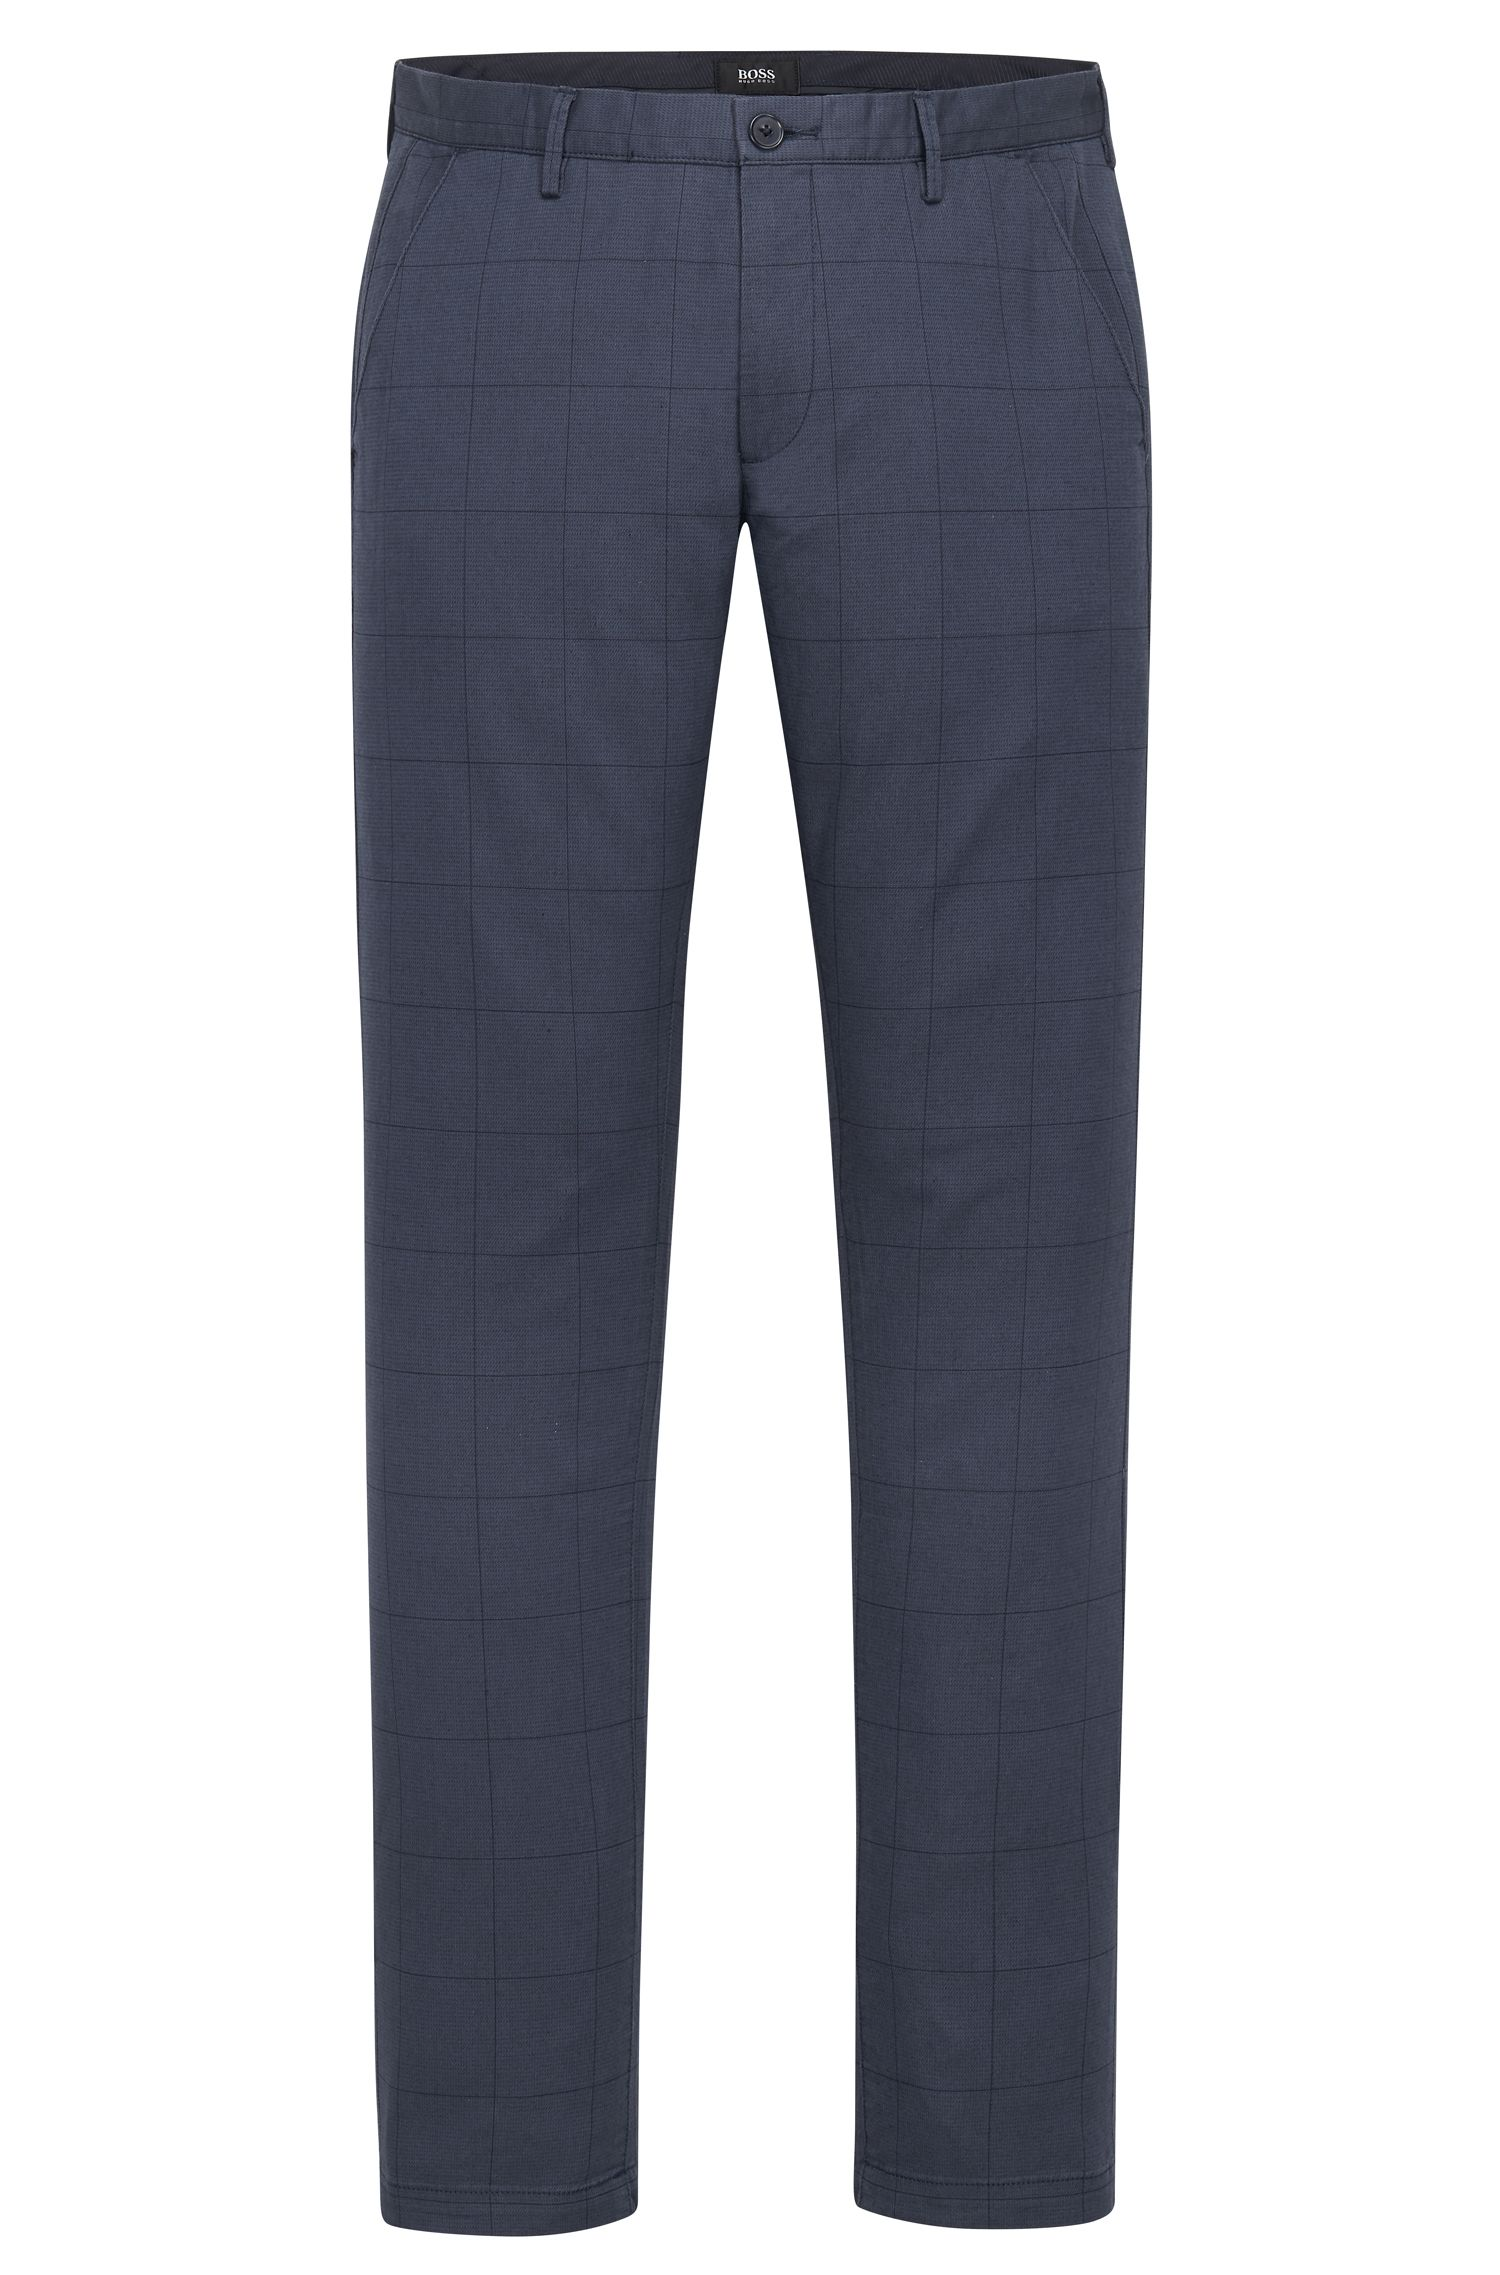 'Rice W' | Slim Fit, Windowpane Stretch Cotton Pants